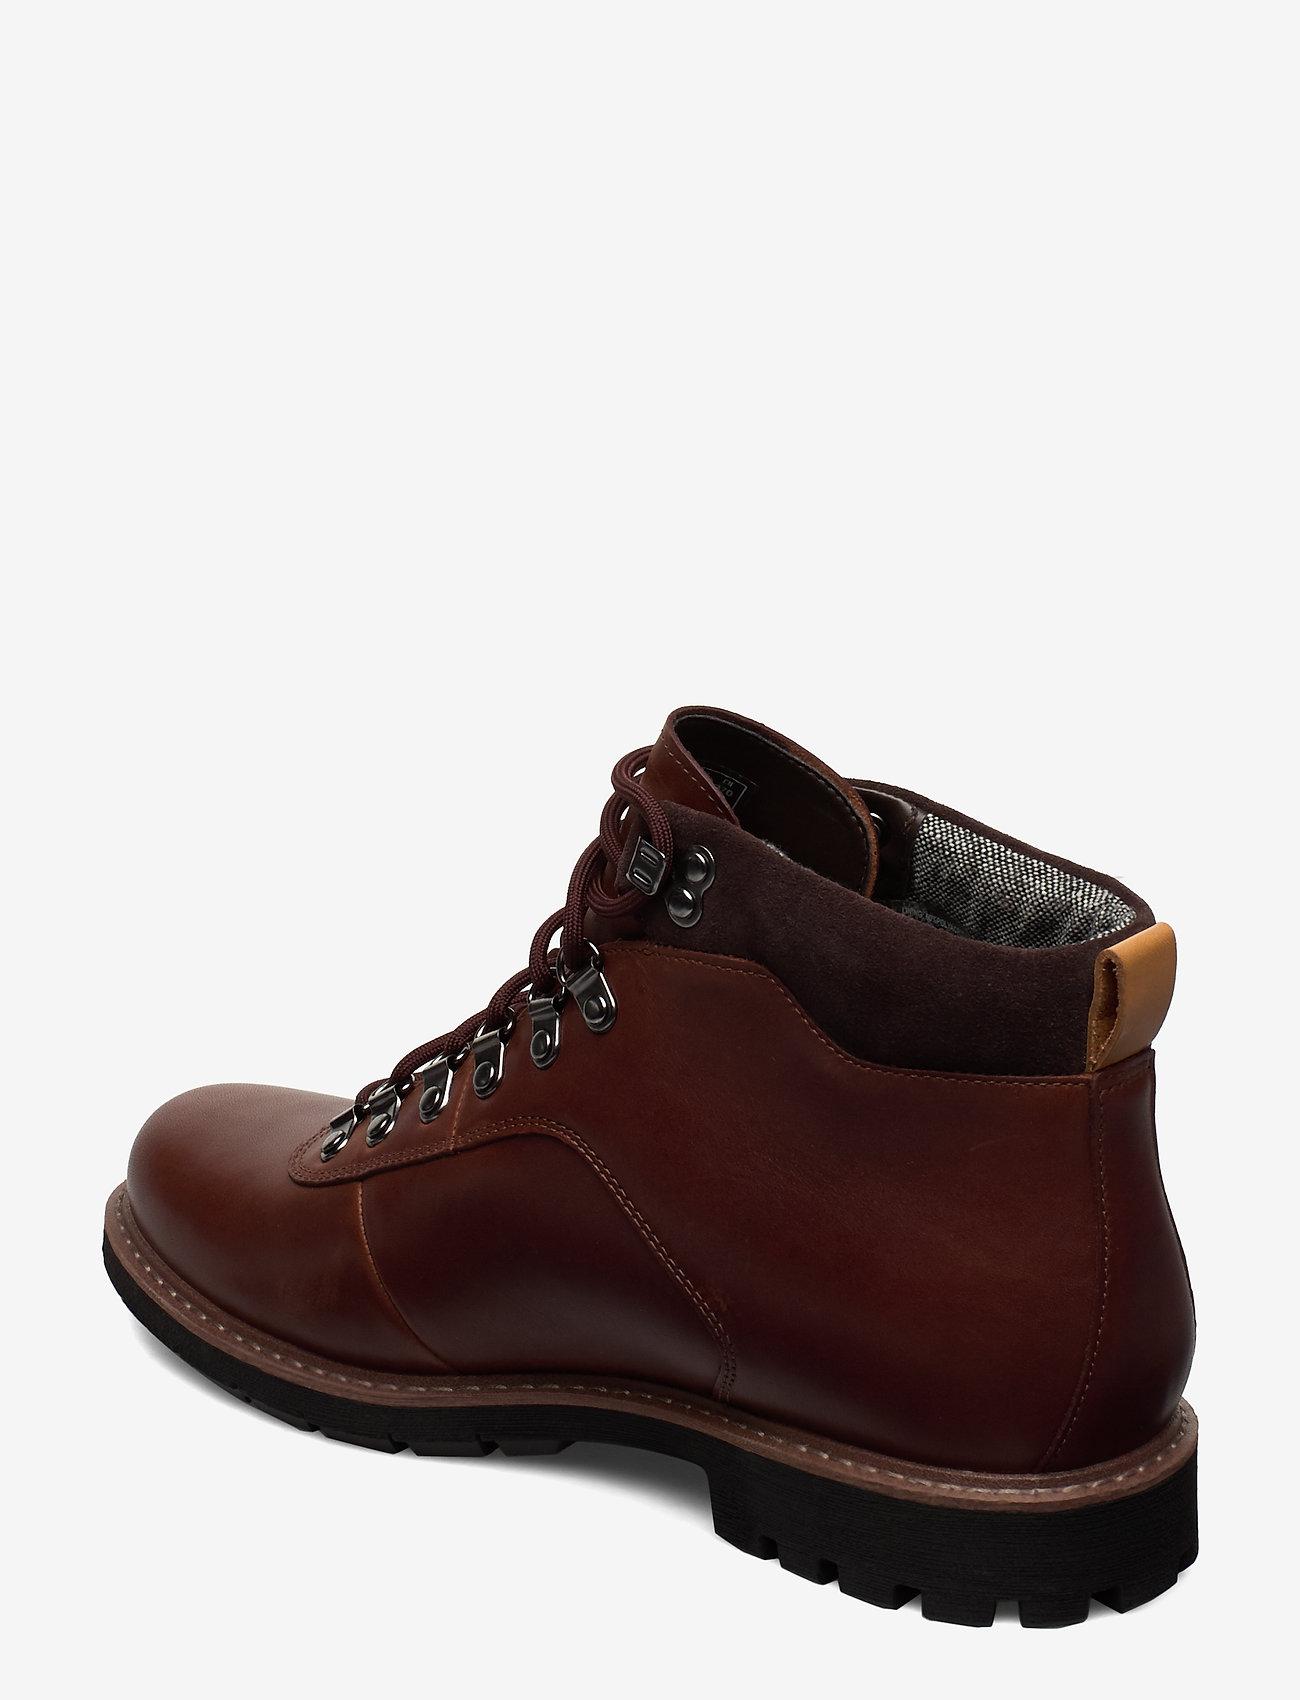 Batcombealpgtx (Tan Leather) - Clarks